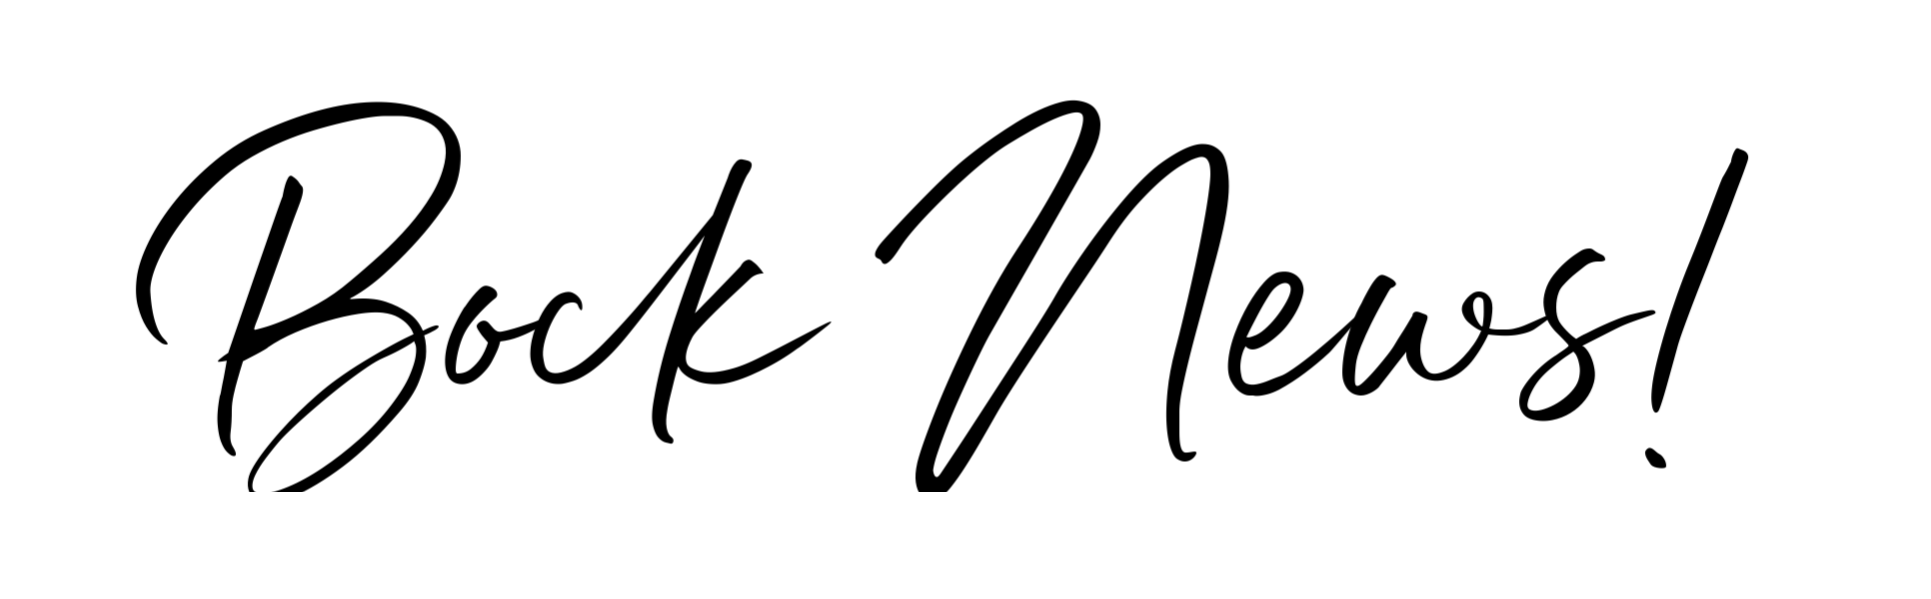 bock_news_osnabrueck.png